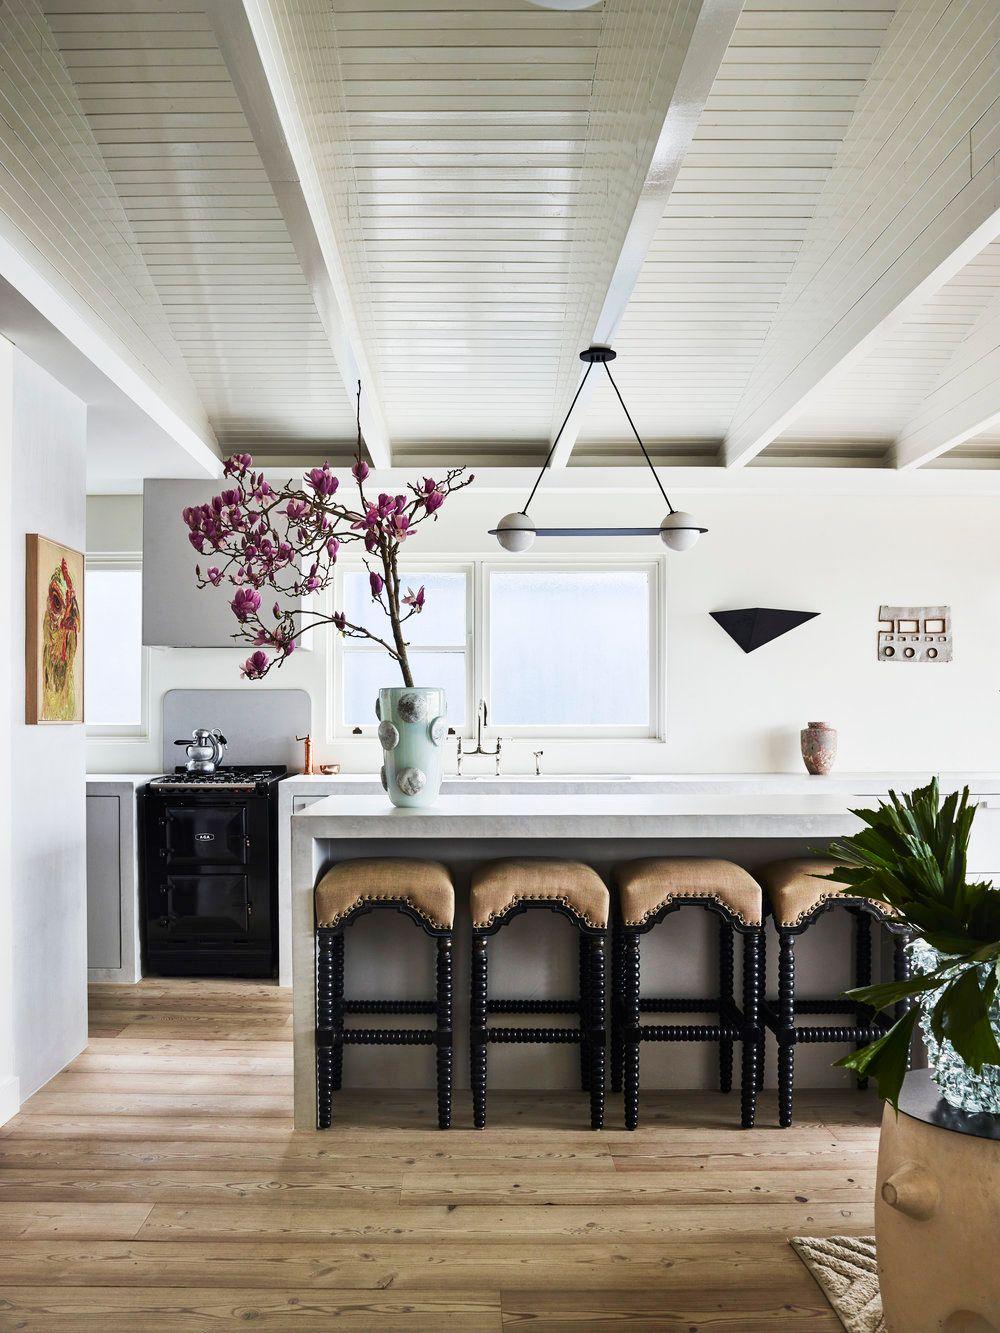 50 Best Kitchen Backsplash Ideas - Tile Designs for Kitchen ...